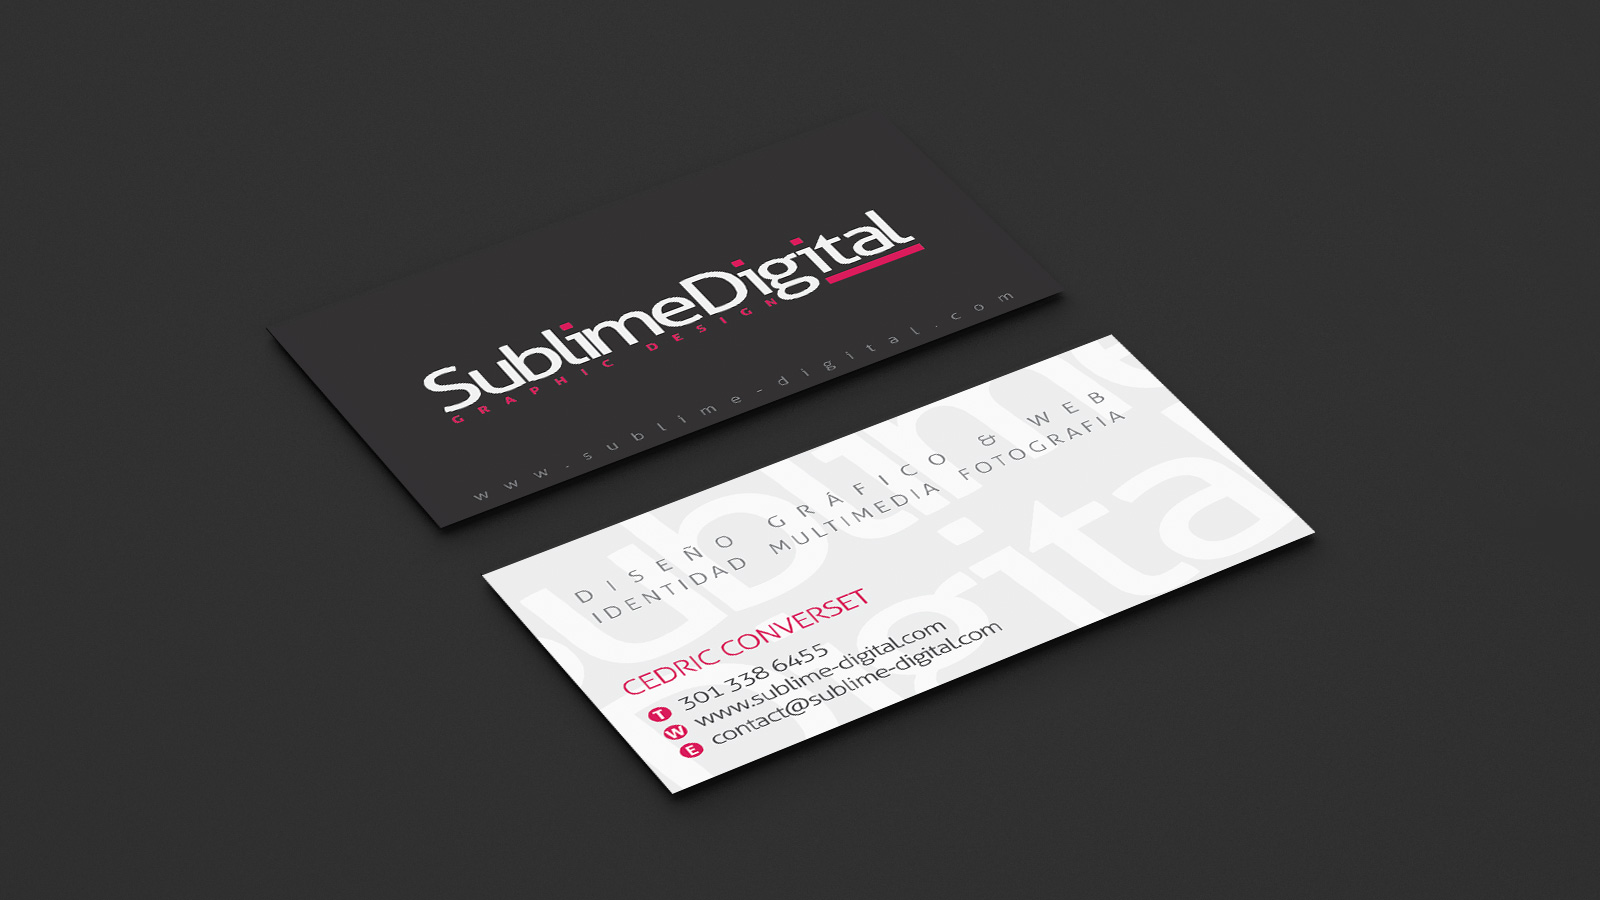 sublime-digital_sublime-digital-identity-06